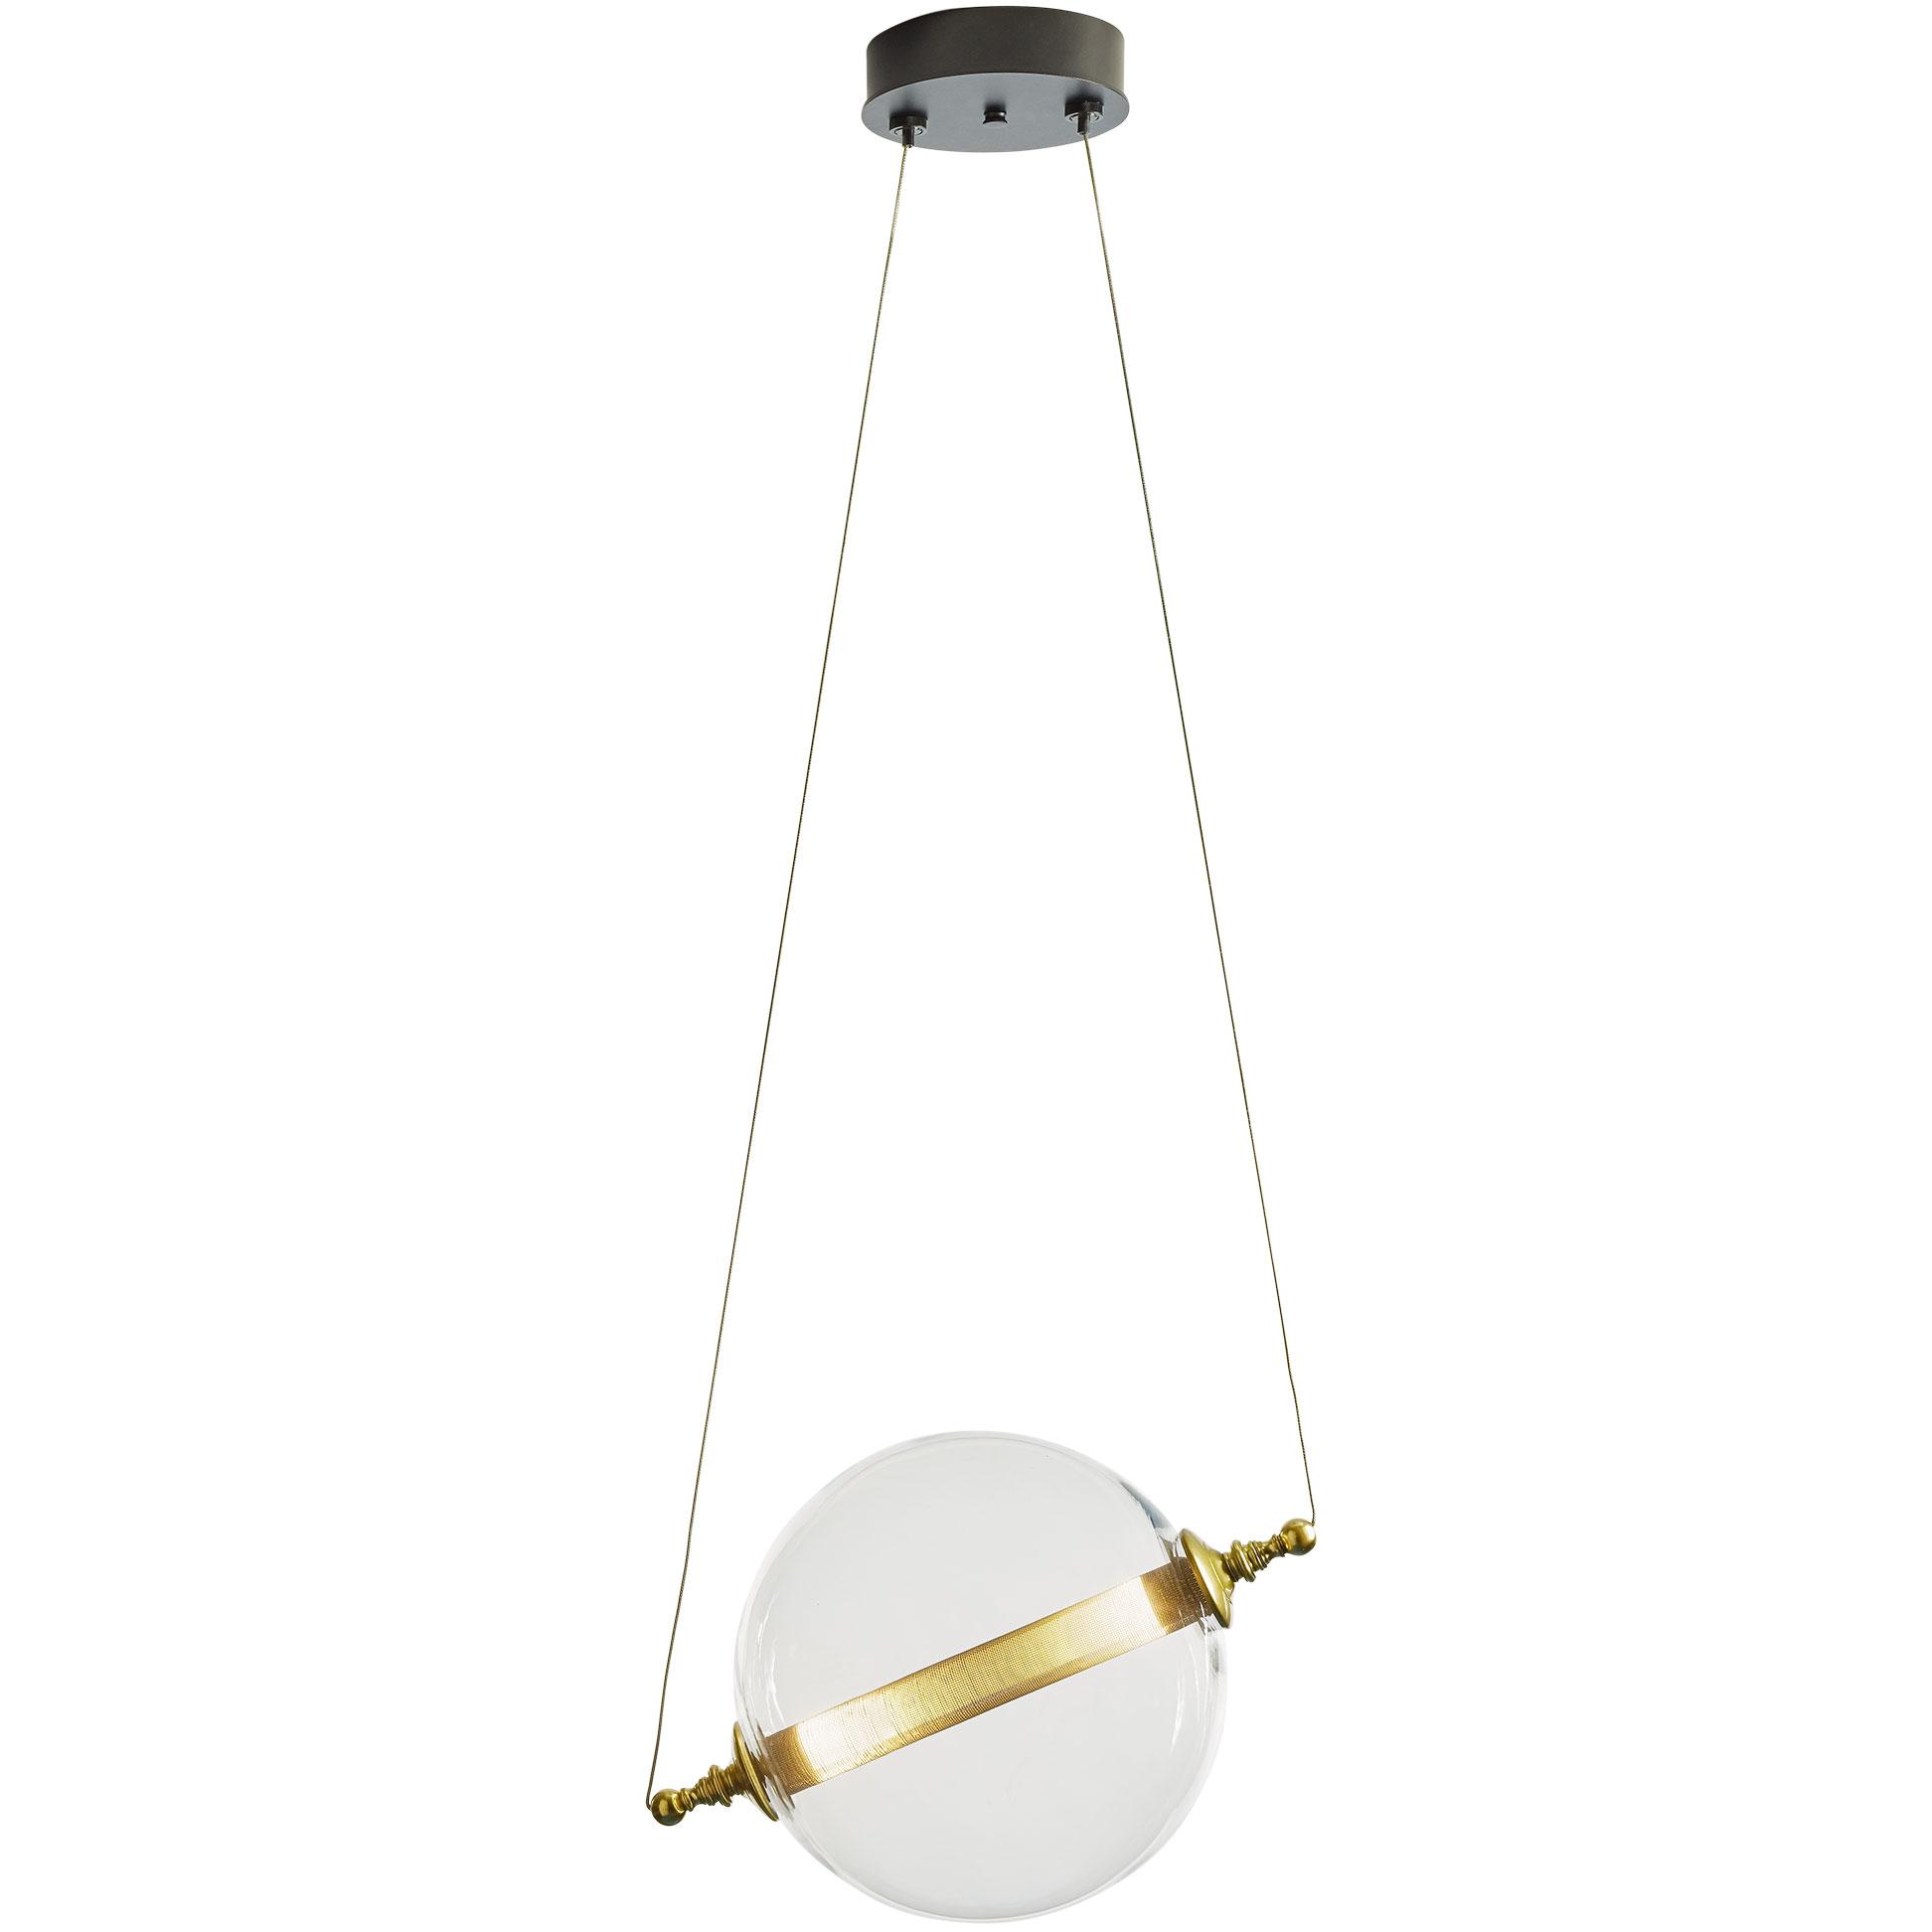 Otto Sphere Low Voltage Mini Pendant by Hubbardton Forge | 161305-1000